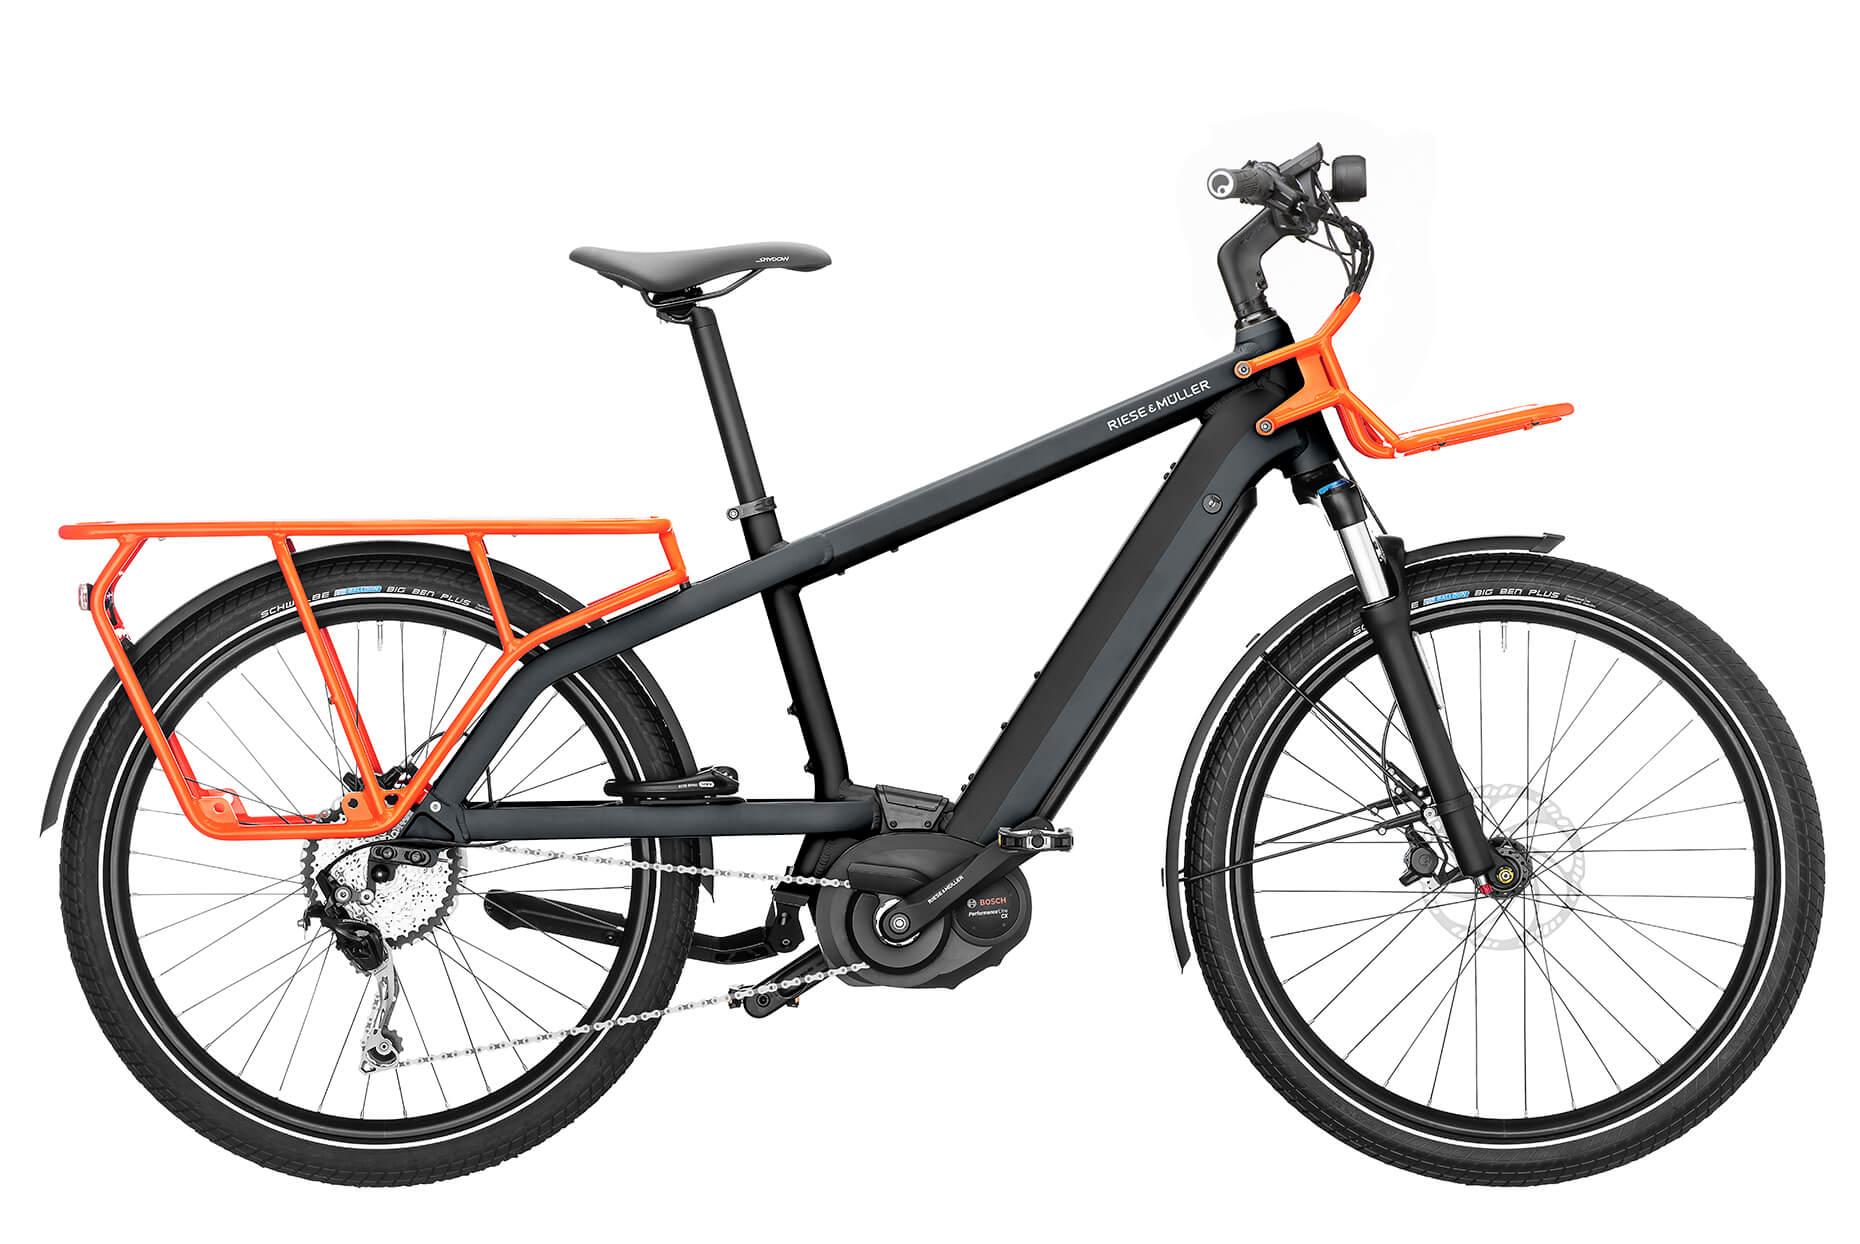 Satori EASY UP Bike Bicycle Cycling Adjustable Handlebar Stem 70mm Black